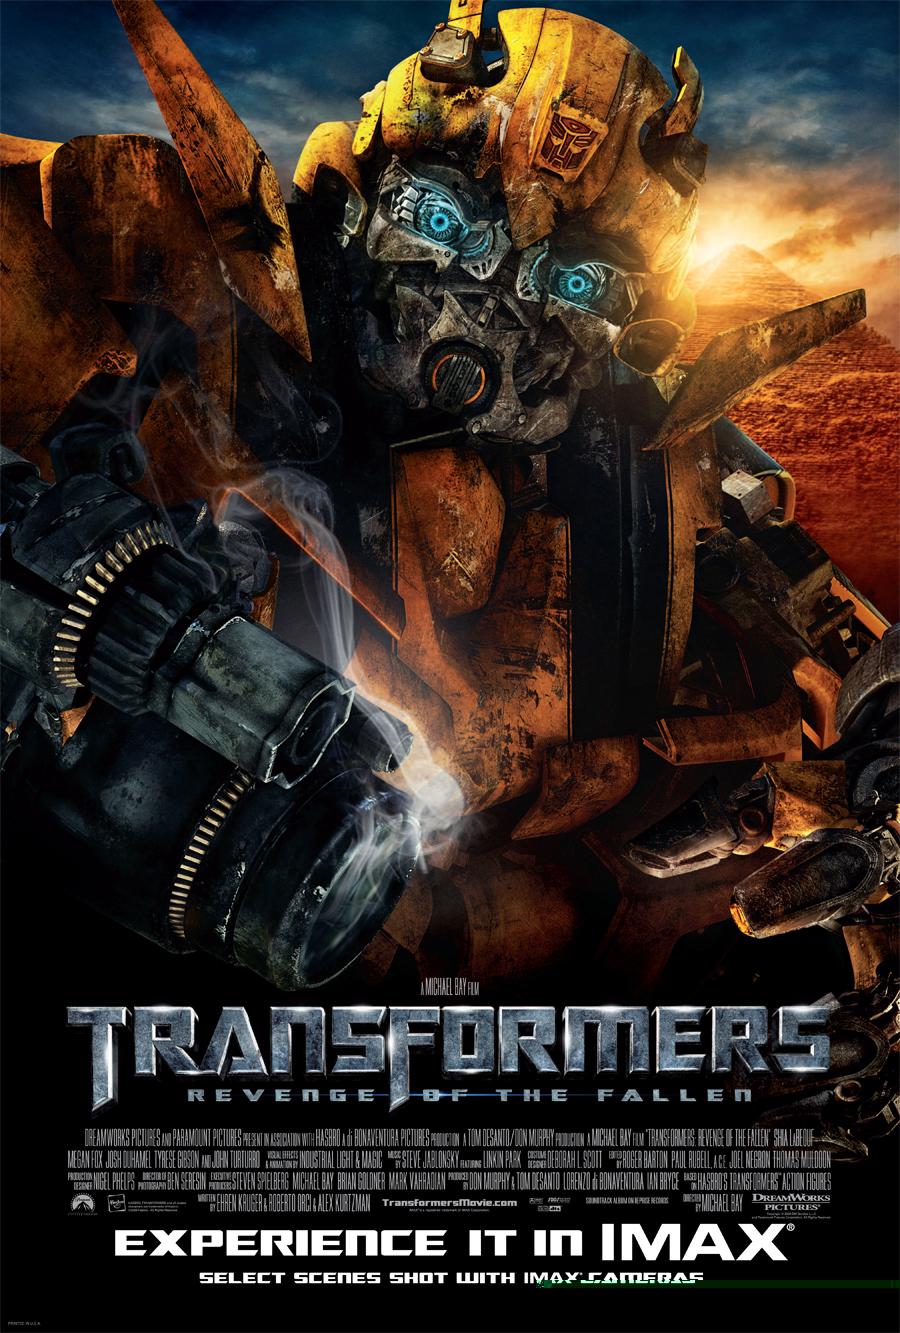 http://media.kino-govno.com/movies/t/transformers2/posters/transformers2_8.jpg